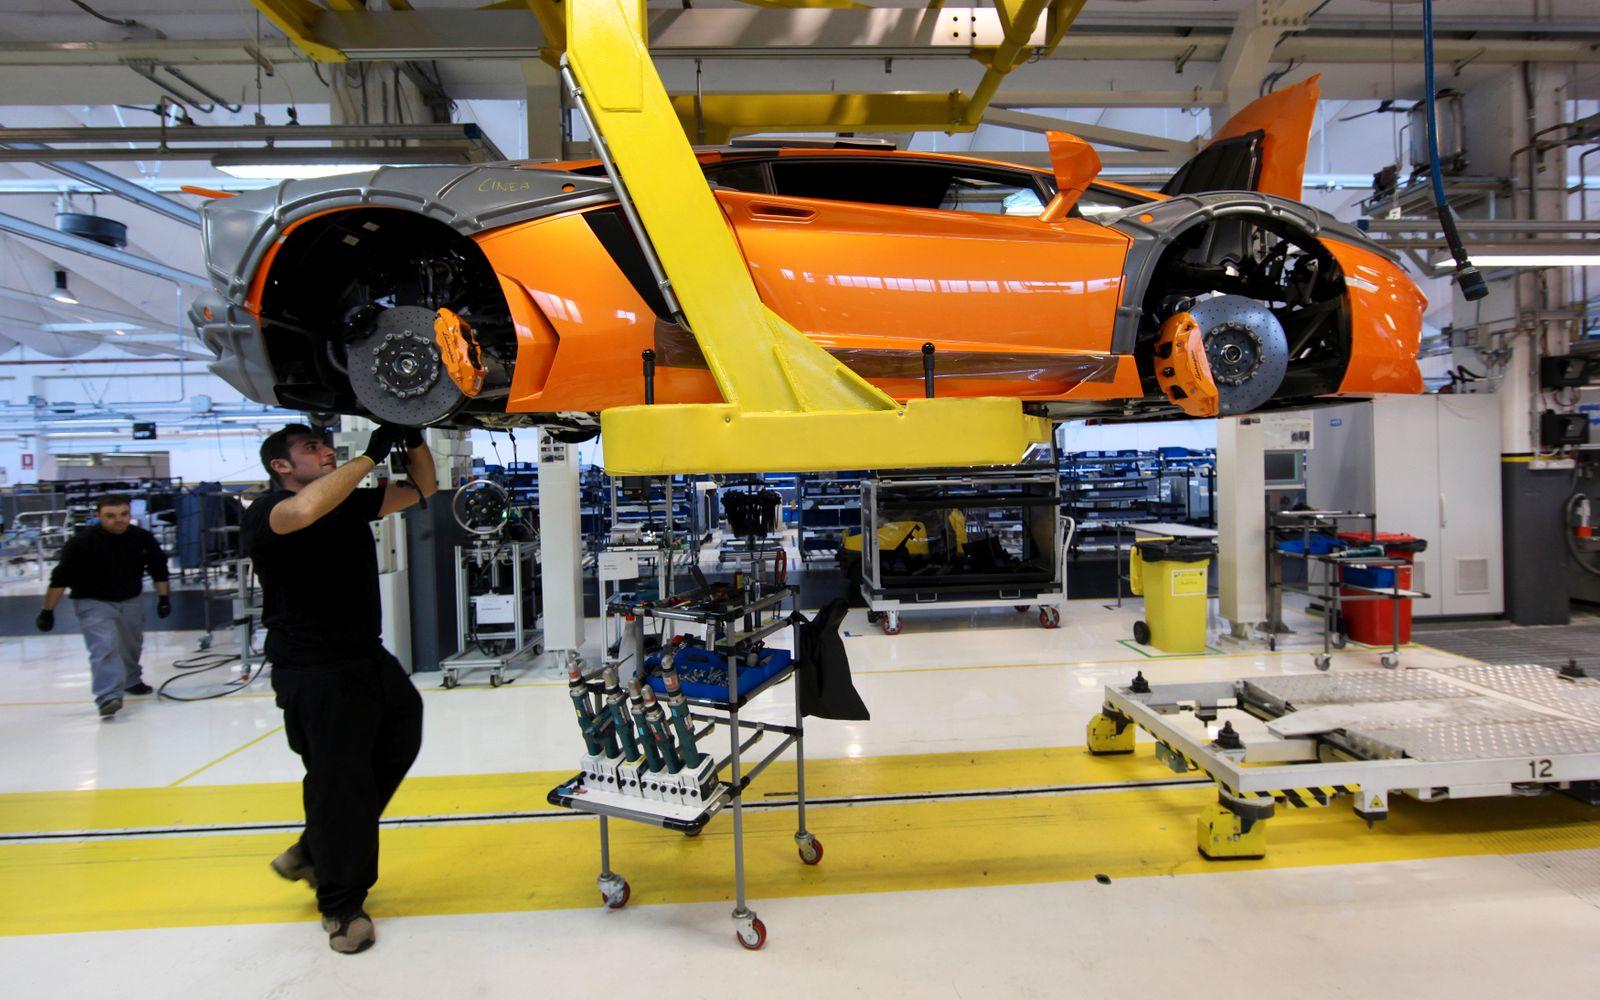 Lamborghini Produktion Santagata Bolognese